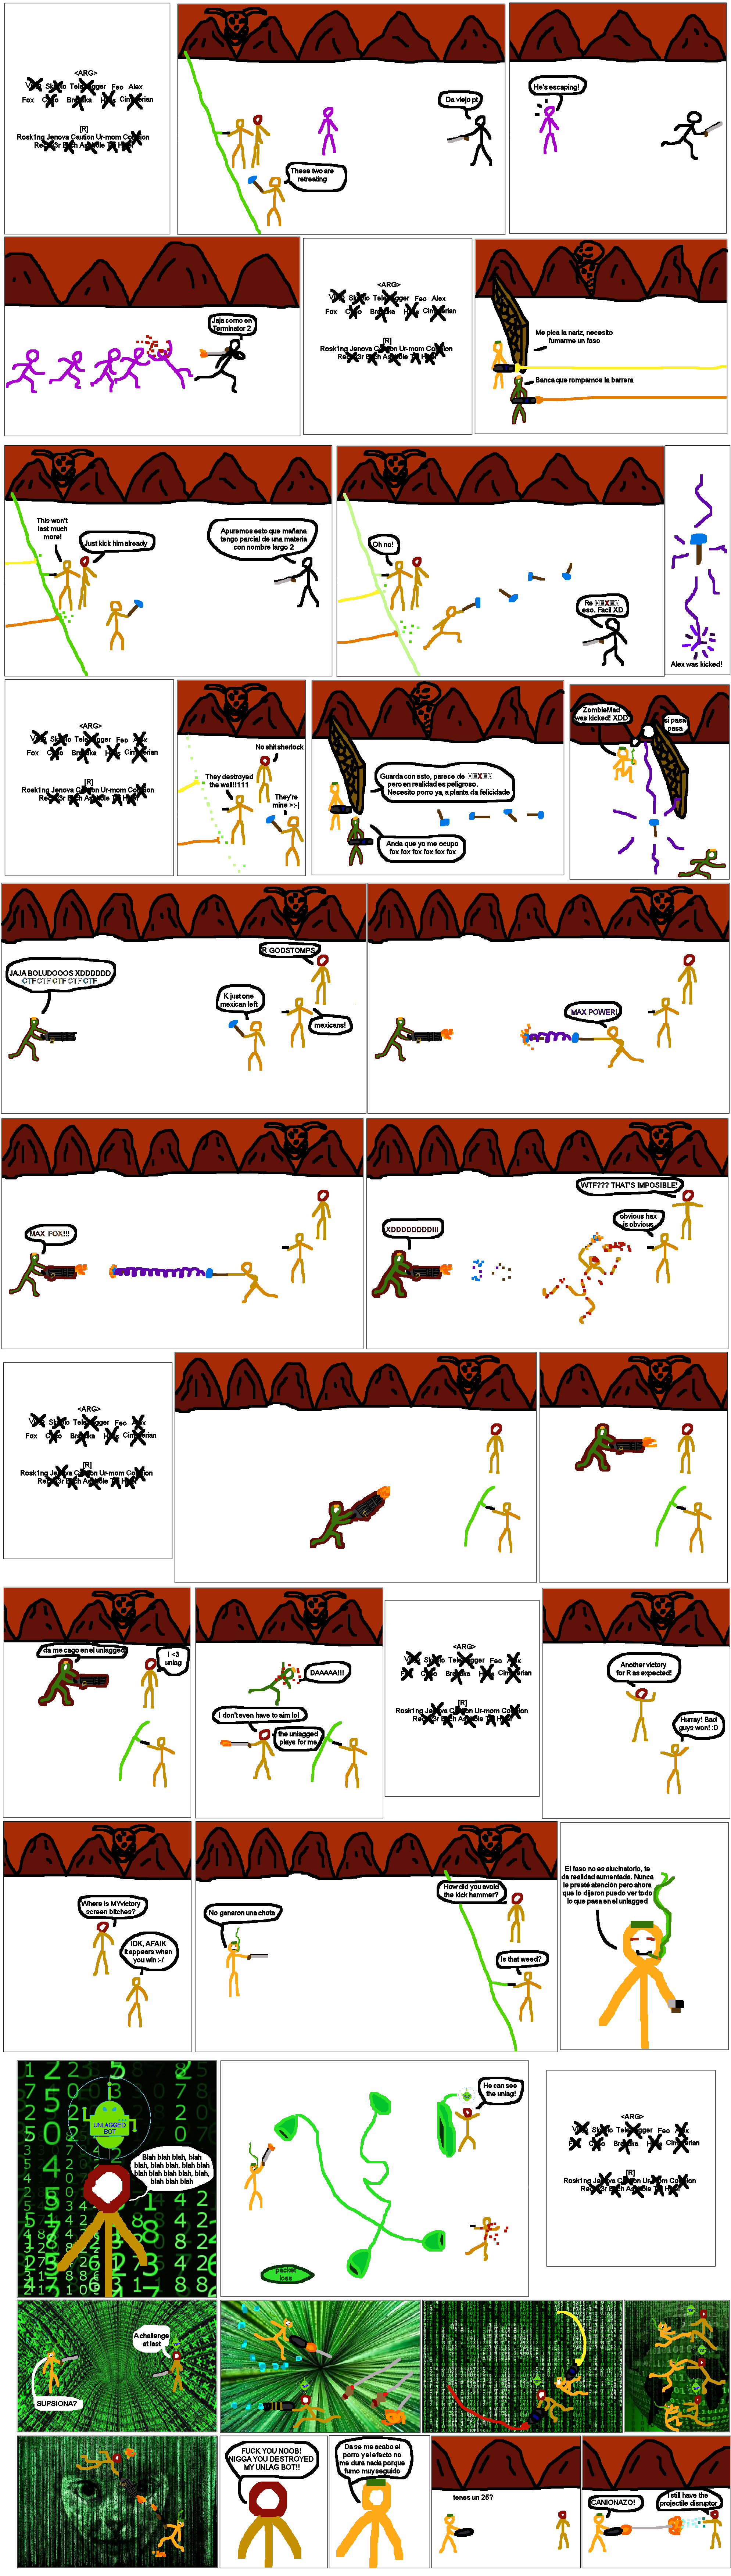 Historieta torneo tlms dragonbolero Pagina_9